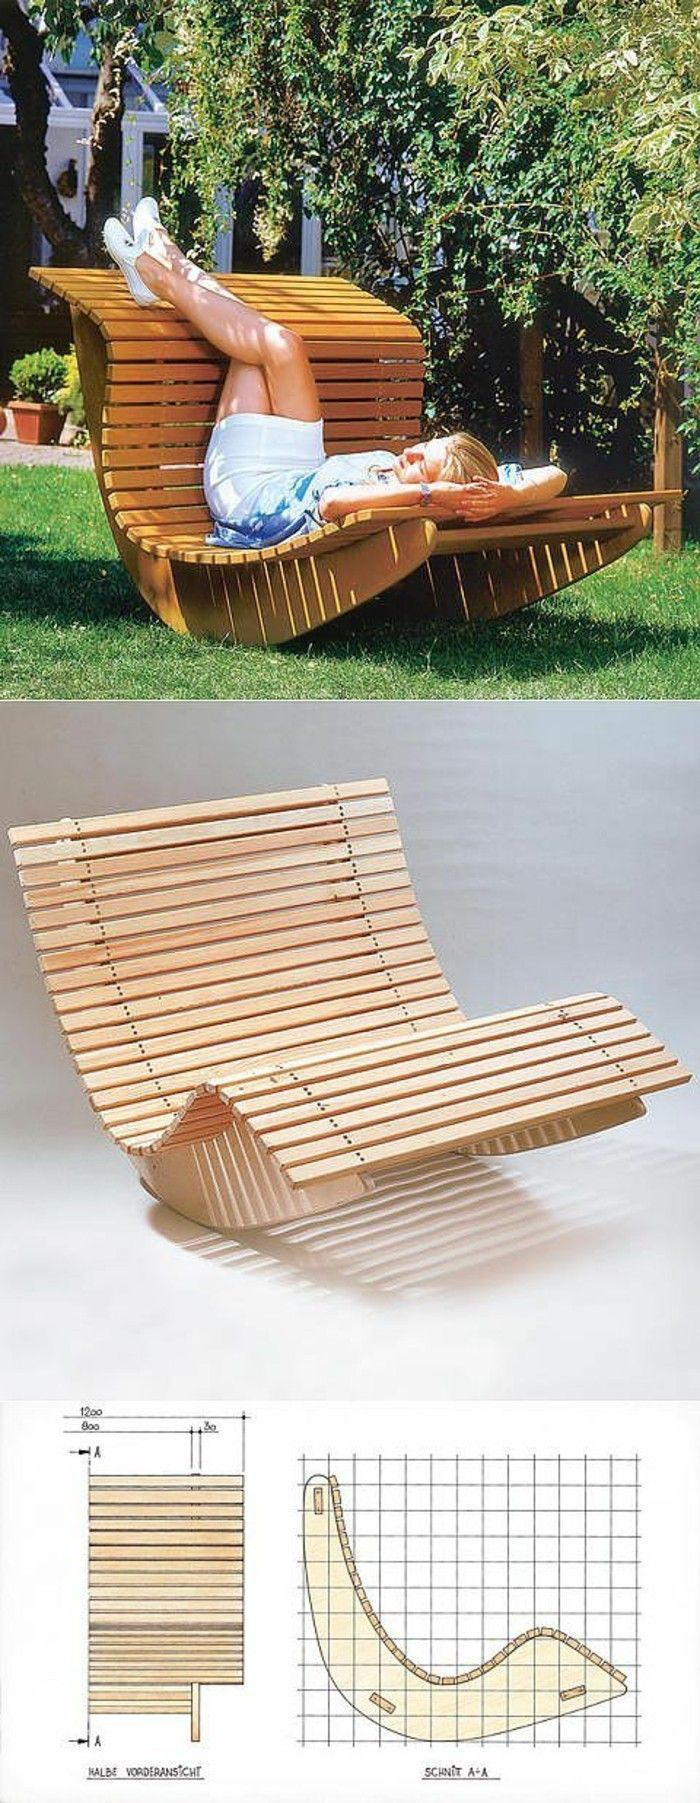 Diy Moebel Do It Yourself Moebel Sessel Aus Holz Selber Bauen Diy Palettenmöbel Palettenmöbel Im Freien Diy Outdoor Möbel